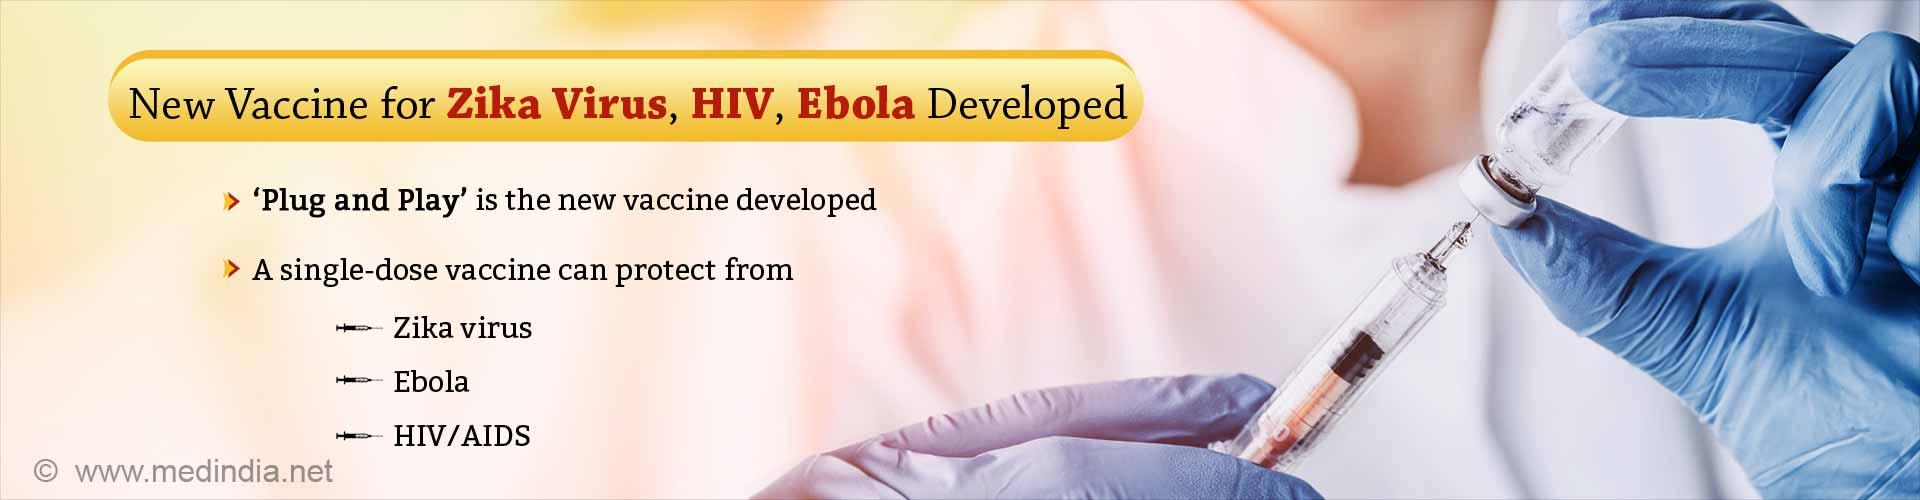 Plug and Play Platform – Single-dose Vaccine for Zika Virus, HIV, Ebola